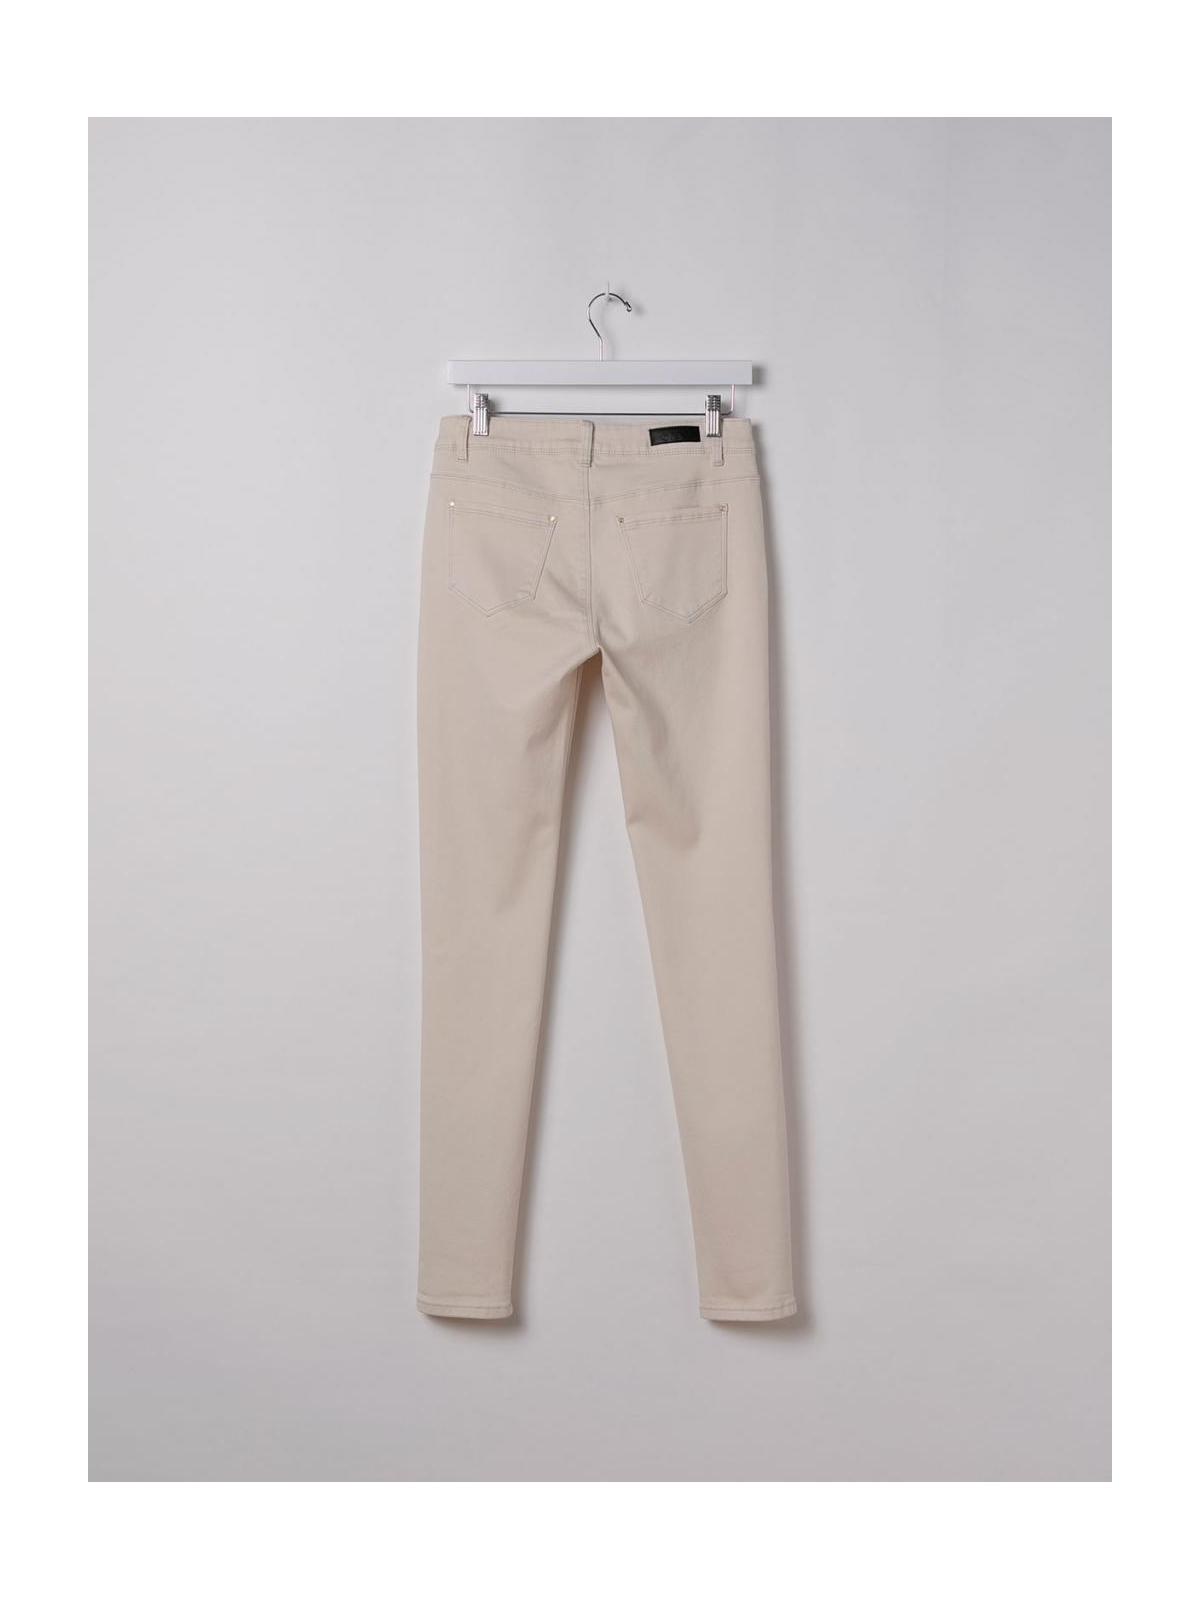 Pantalón mujer 5 bolsillos elastico Beige